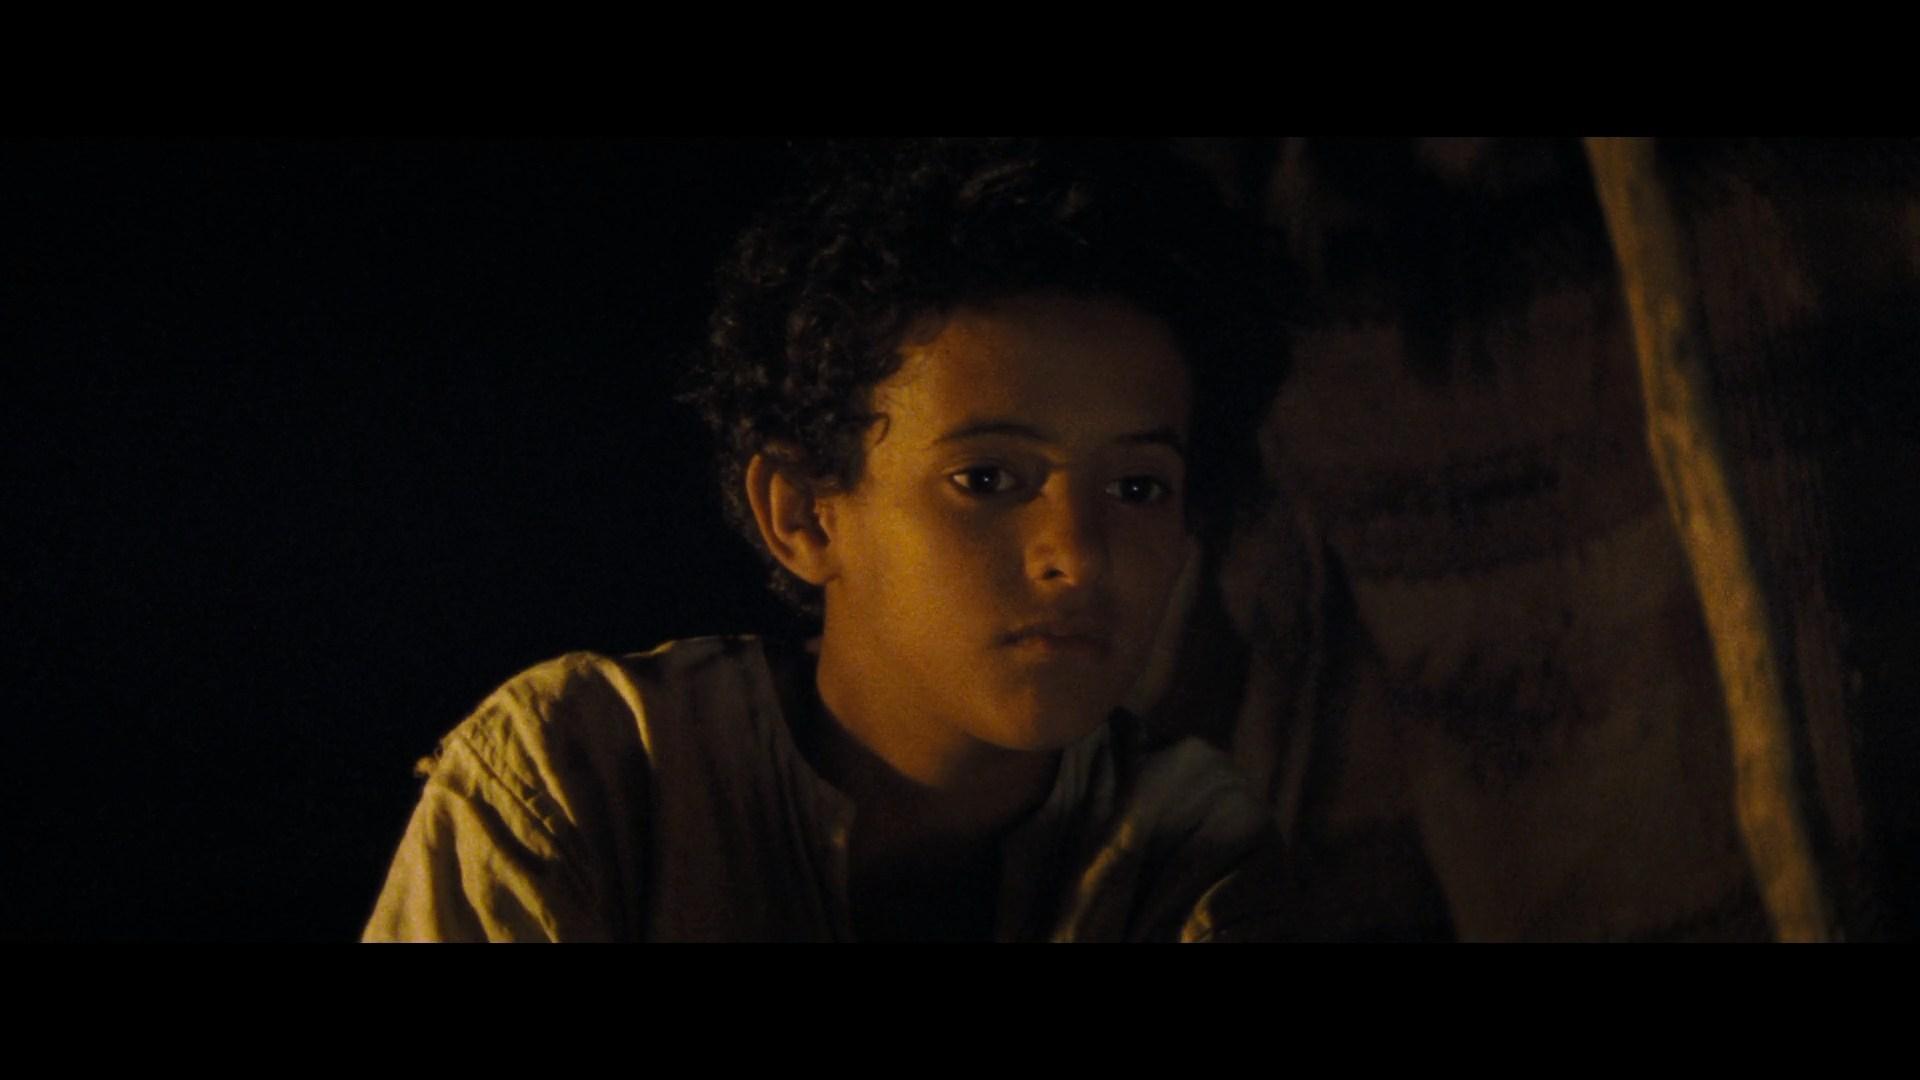 [فيلم][تورنت][تحميل][ذيب][2014][1080p][Web-DL] 5 arabp2p.com